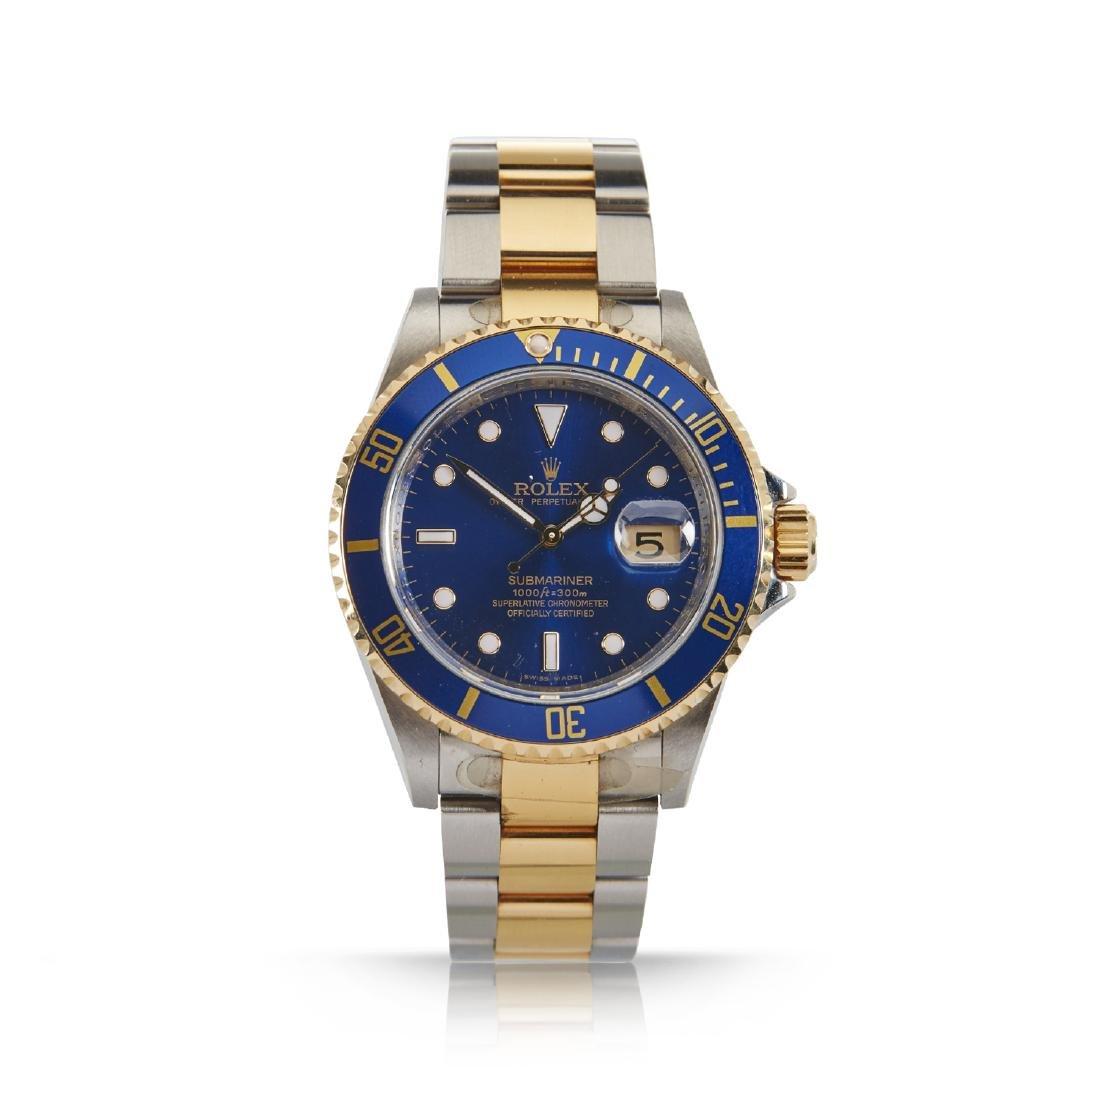 Rolex, Blue Submariner, Ref. 16113